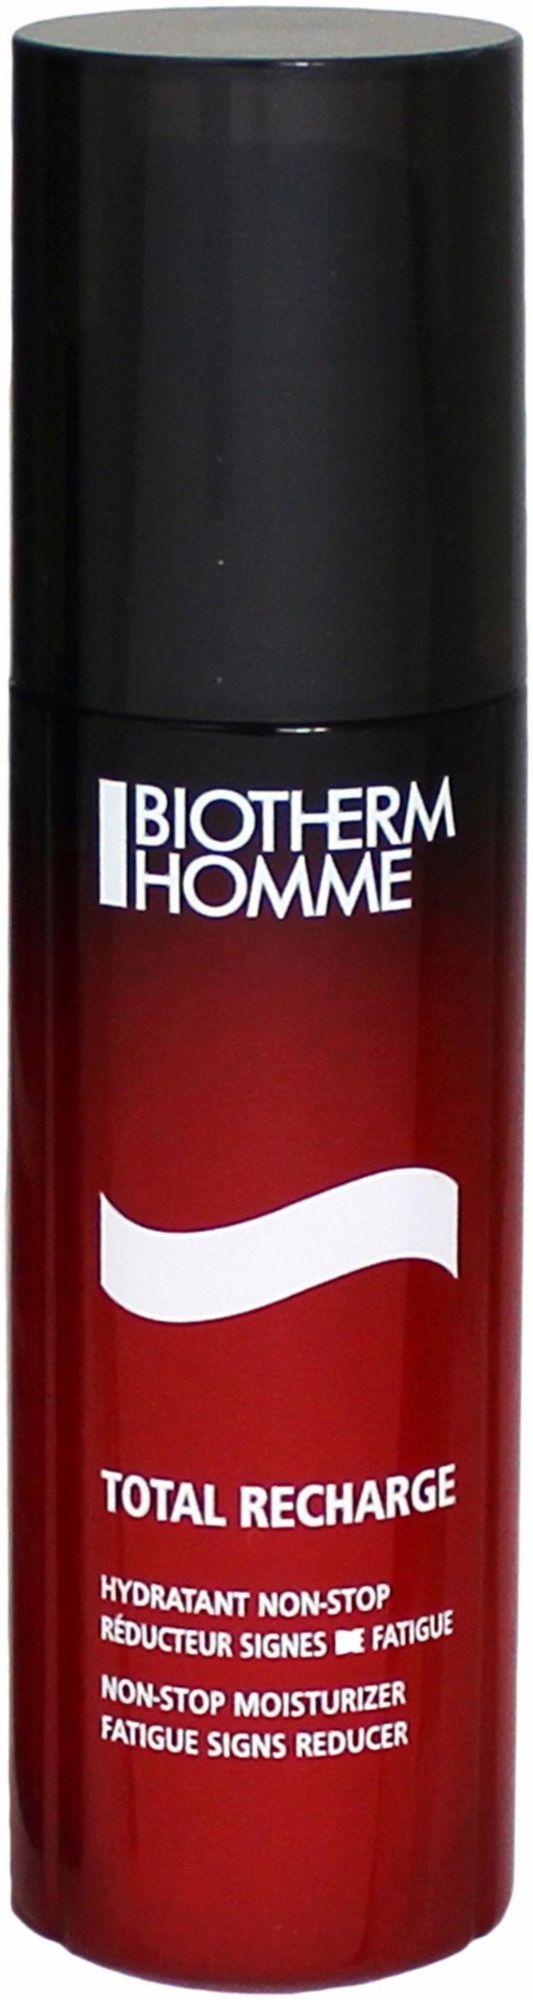 BIOTHERM Biotherm Homme, »Total Recharge«, Feuchtigkeitspflege